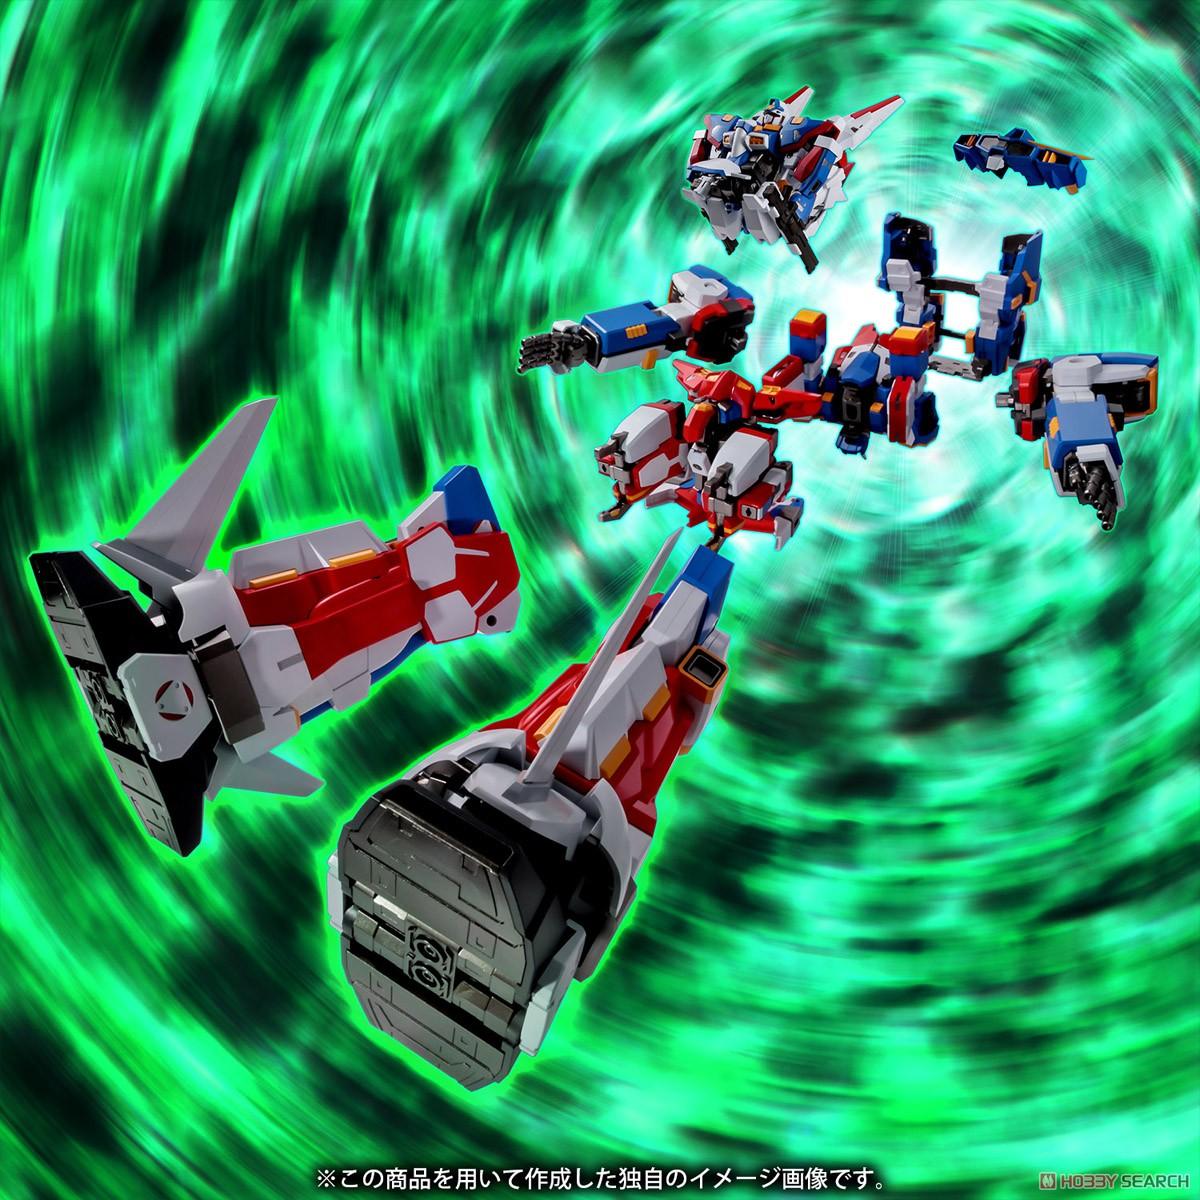 RIOBOT『変形合体 R-1』スーパーロボット大戦OG 可変合体フィギュア-057